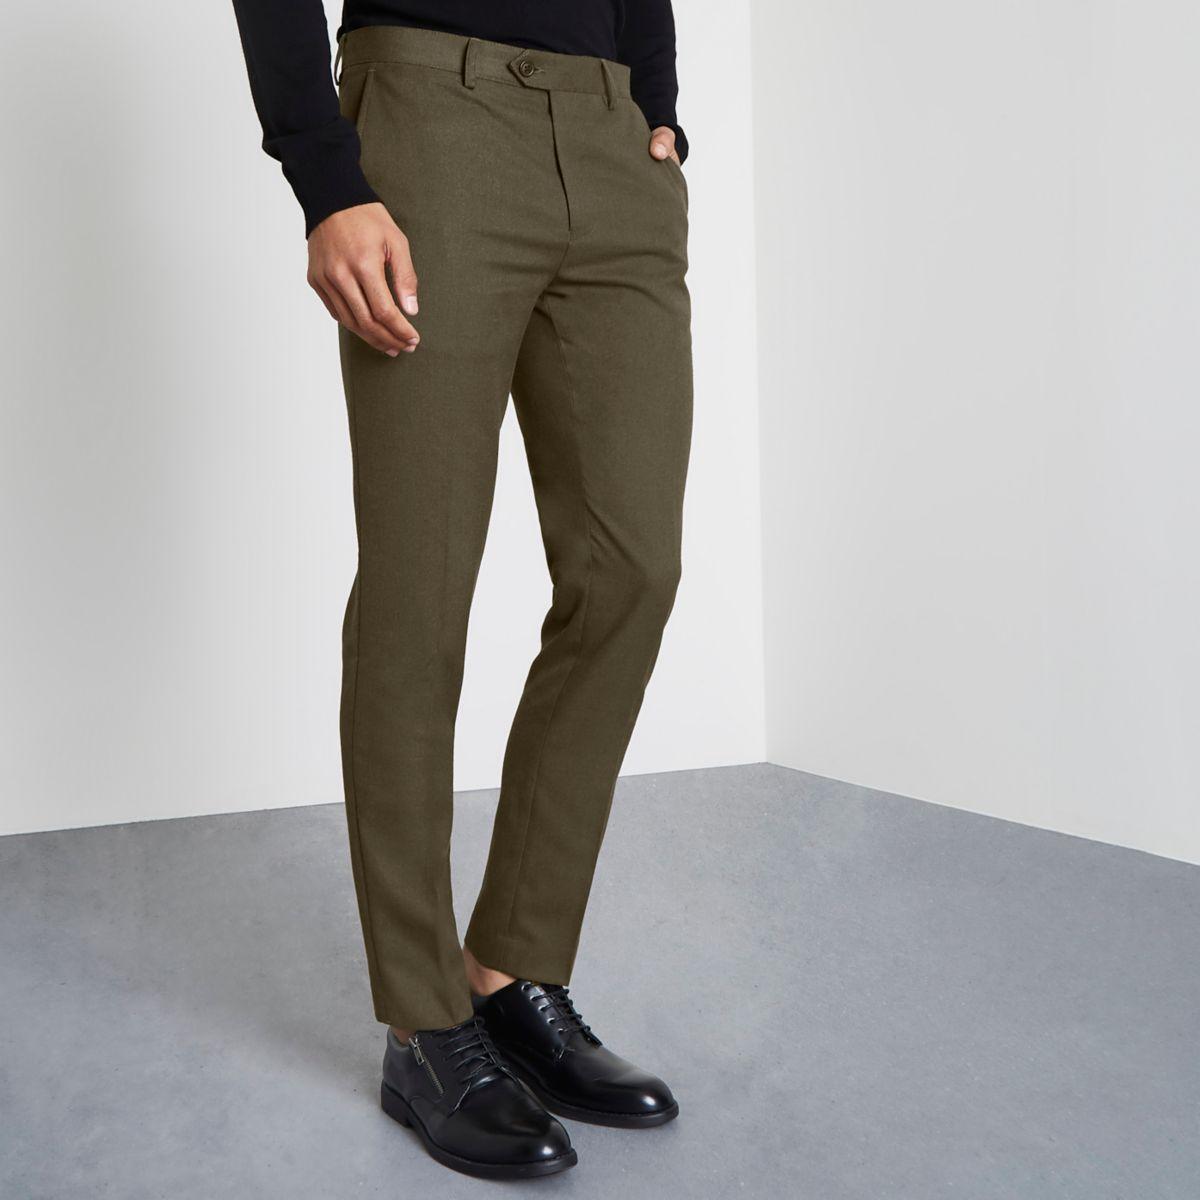 Khaki green smart skinny fit trousers